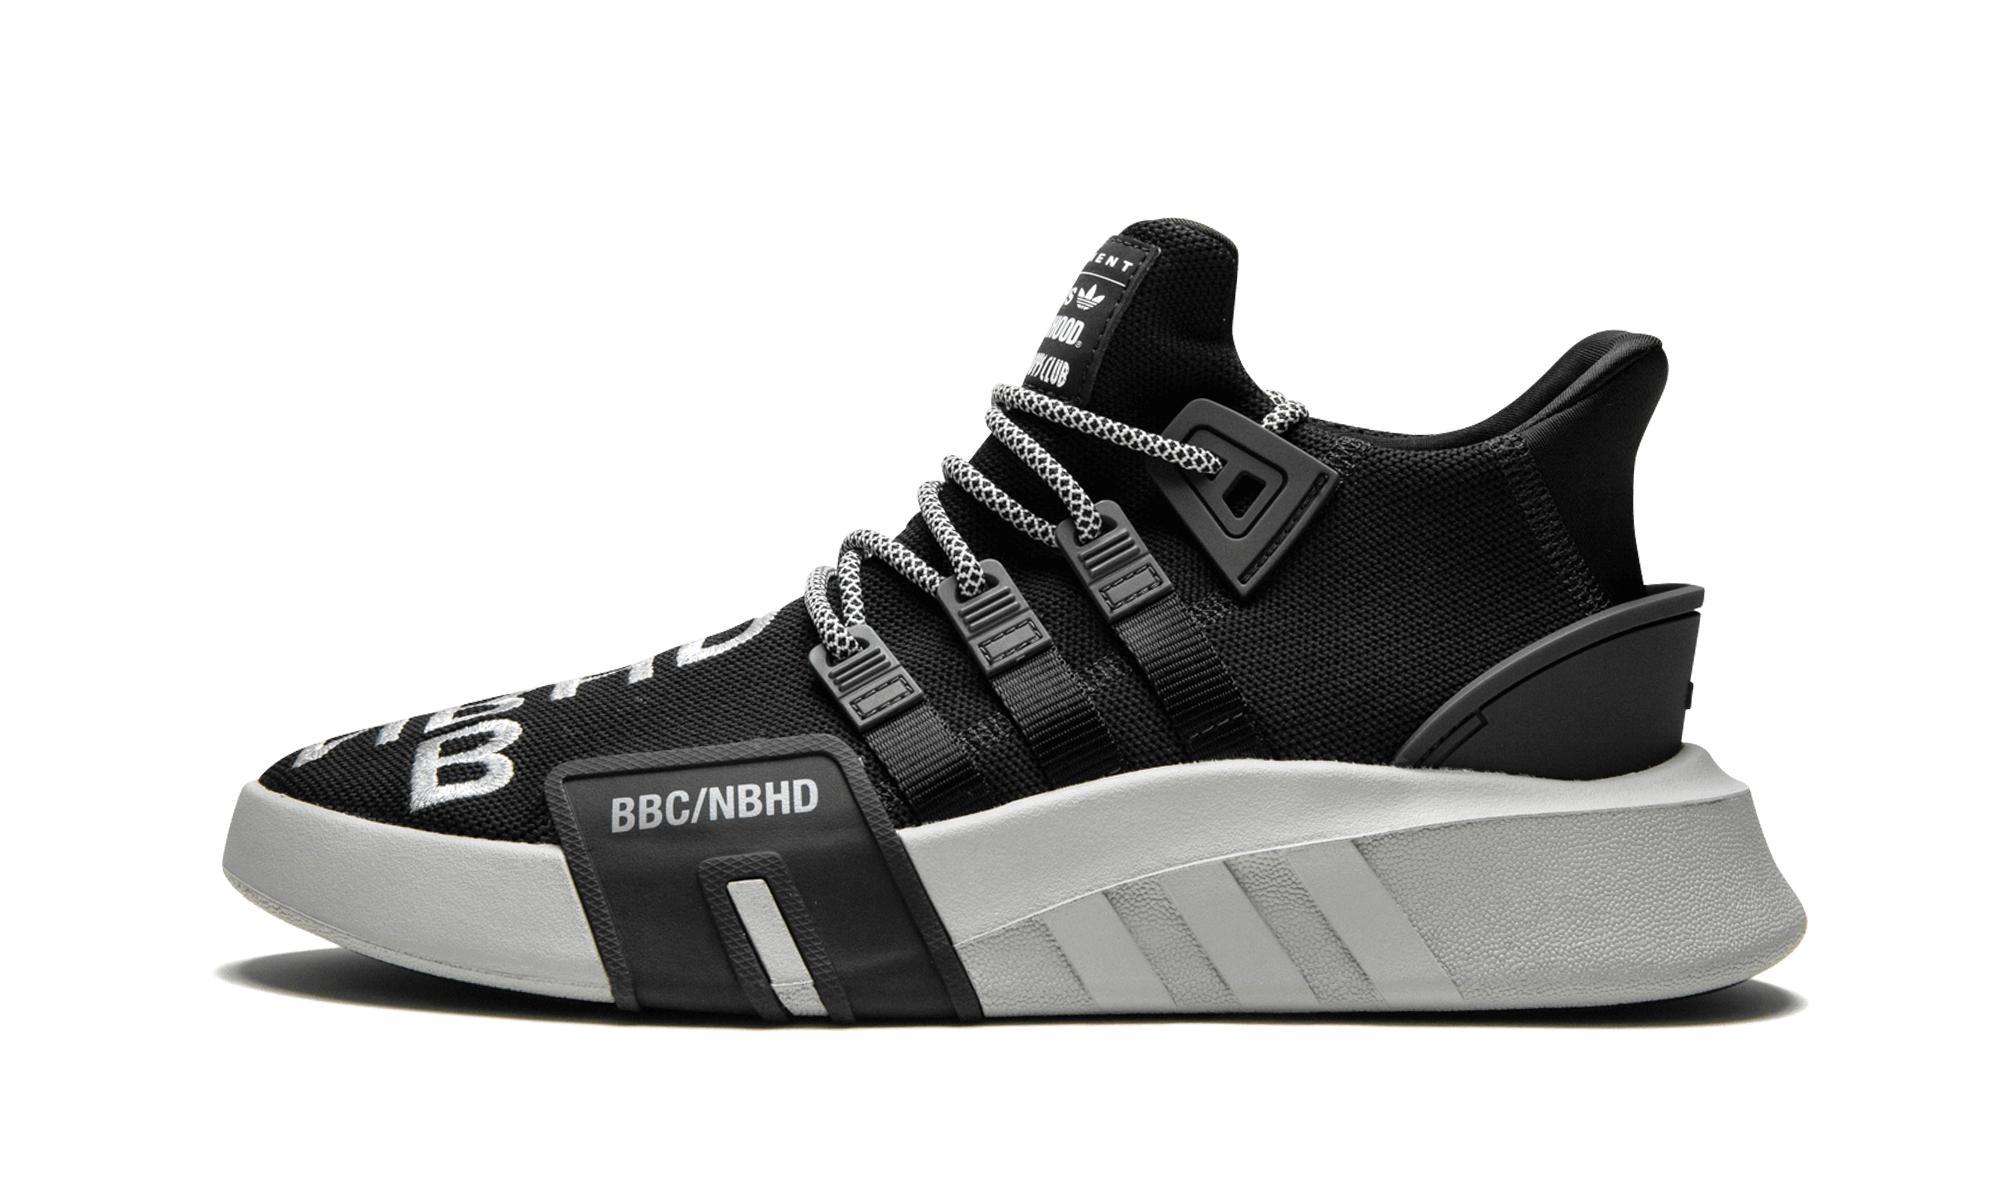 adidas Eqt Bask Adv Nbhd in Black for Men - Lyst 99f02fe6c